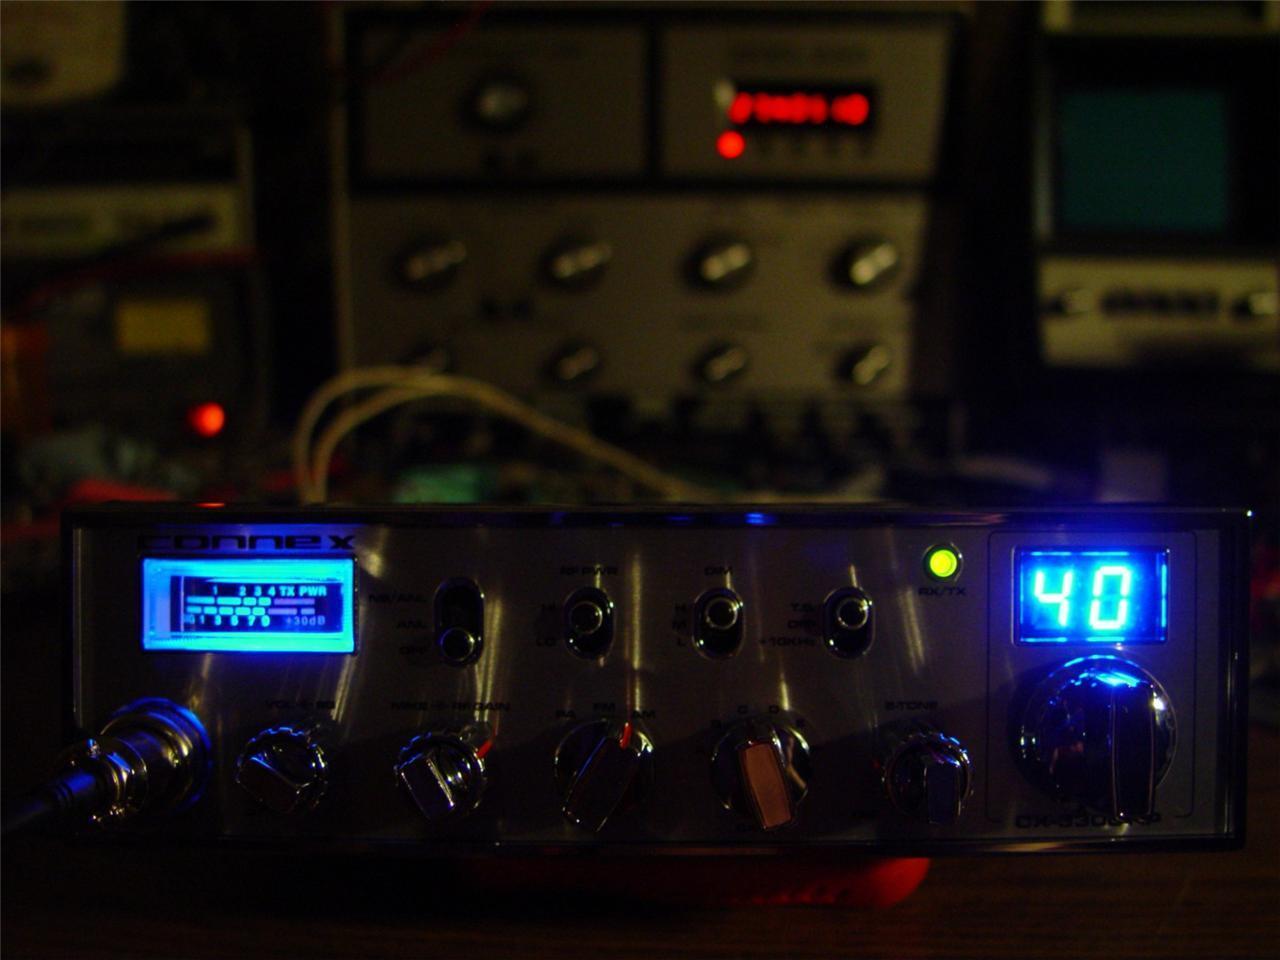 Connex 3300hp 10 Meter Amateur Radio w/ Roger Beep